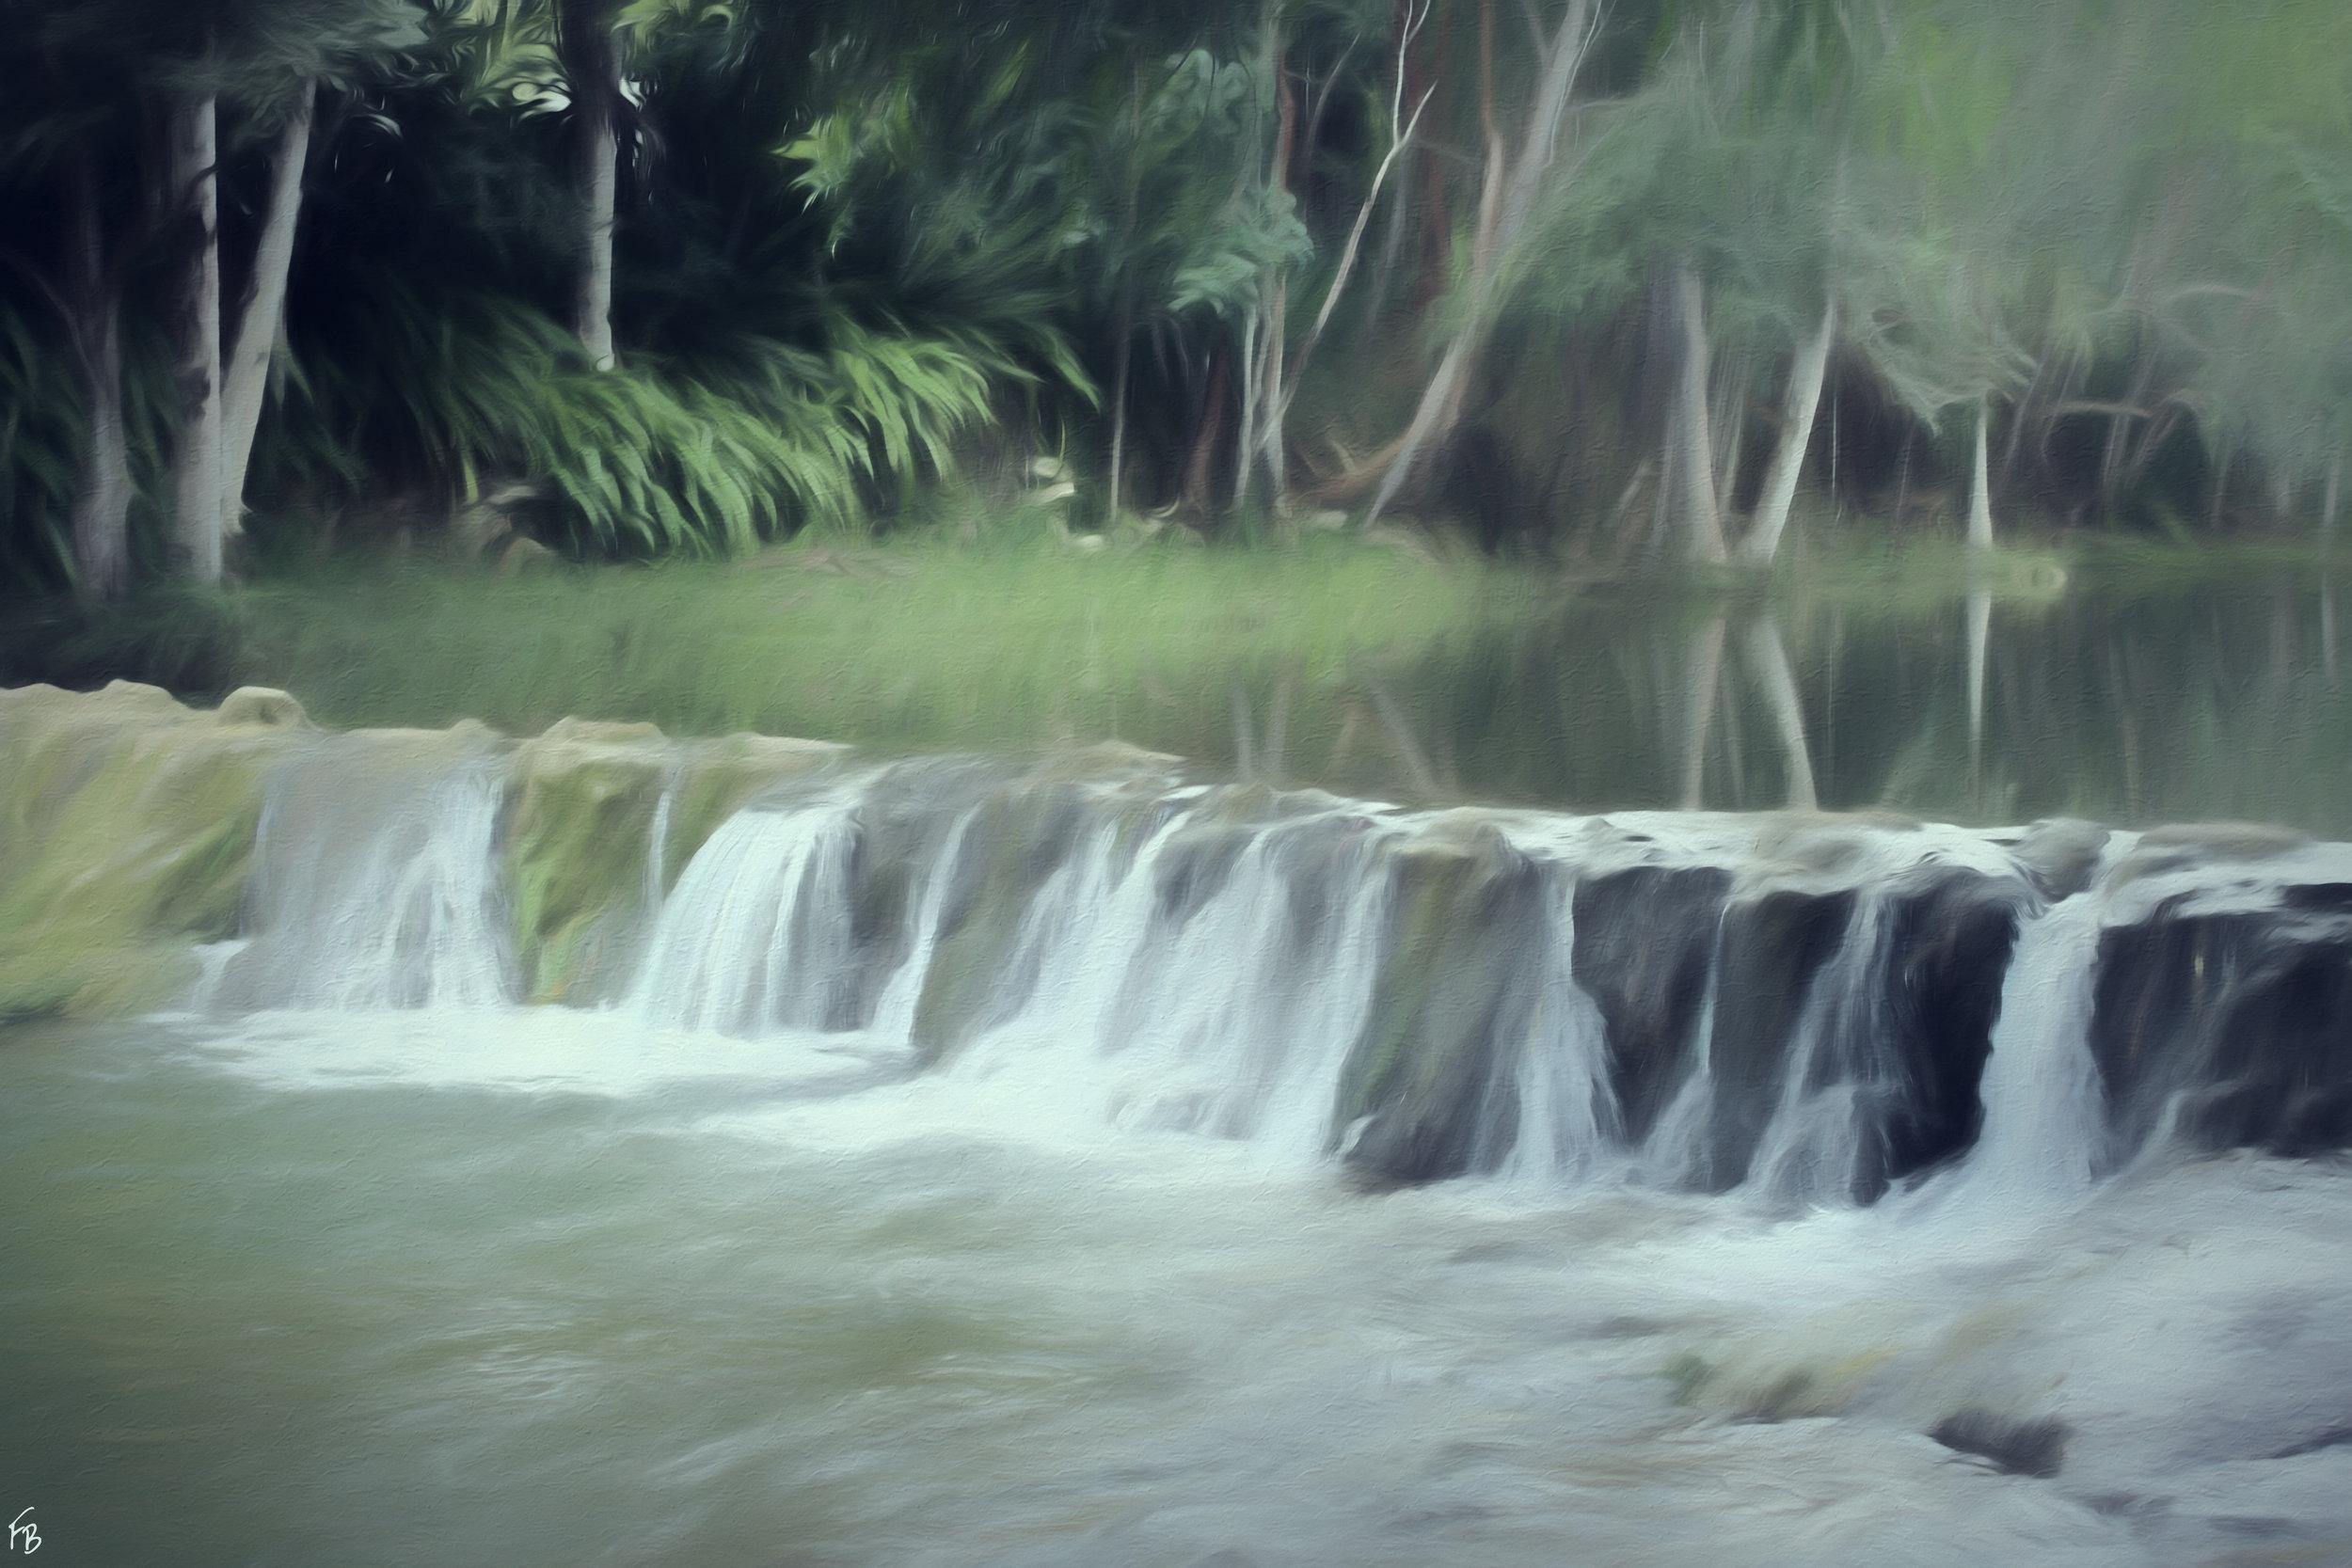 Tropic waters